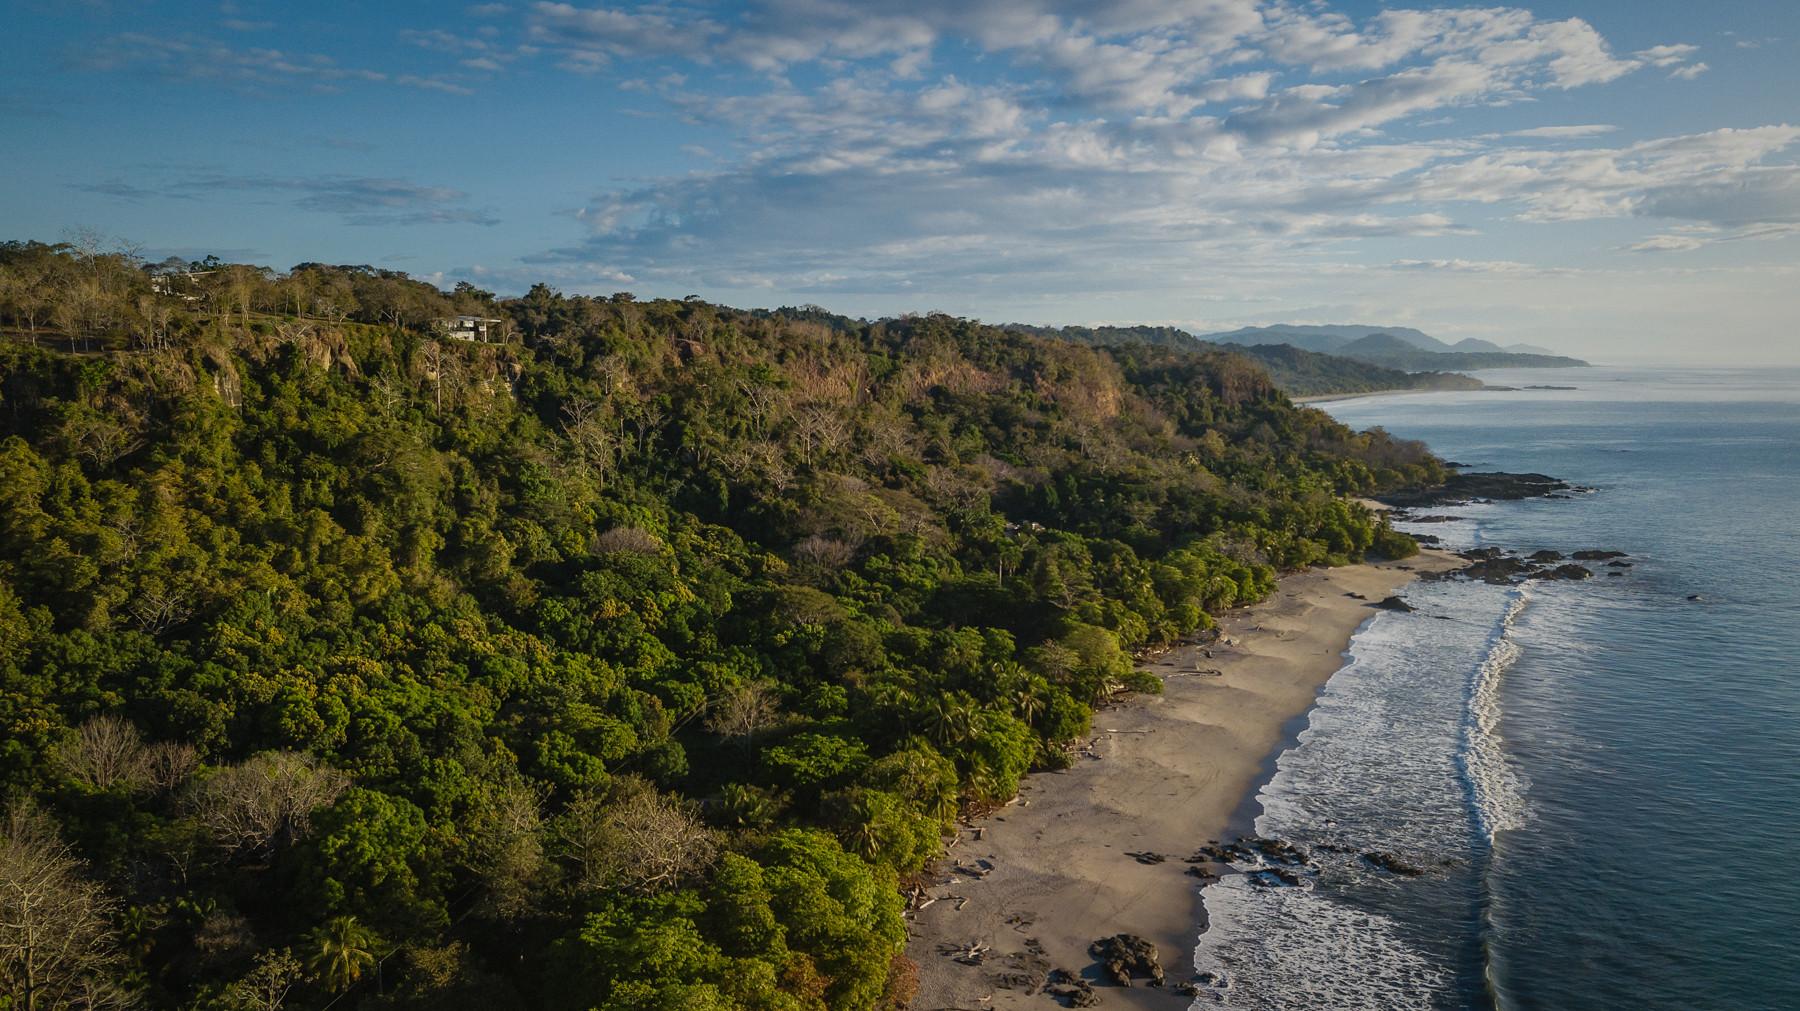 Drone-MontezumaHouse-Port-1.jpg